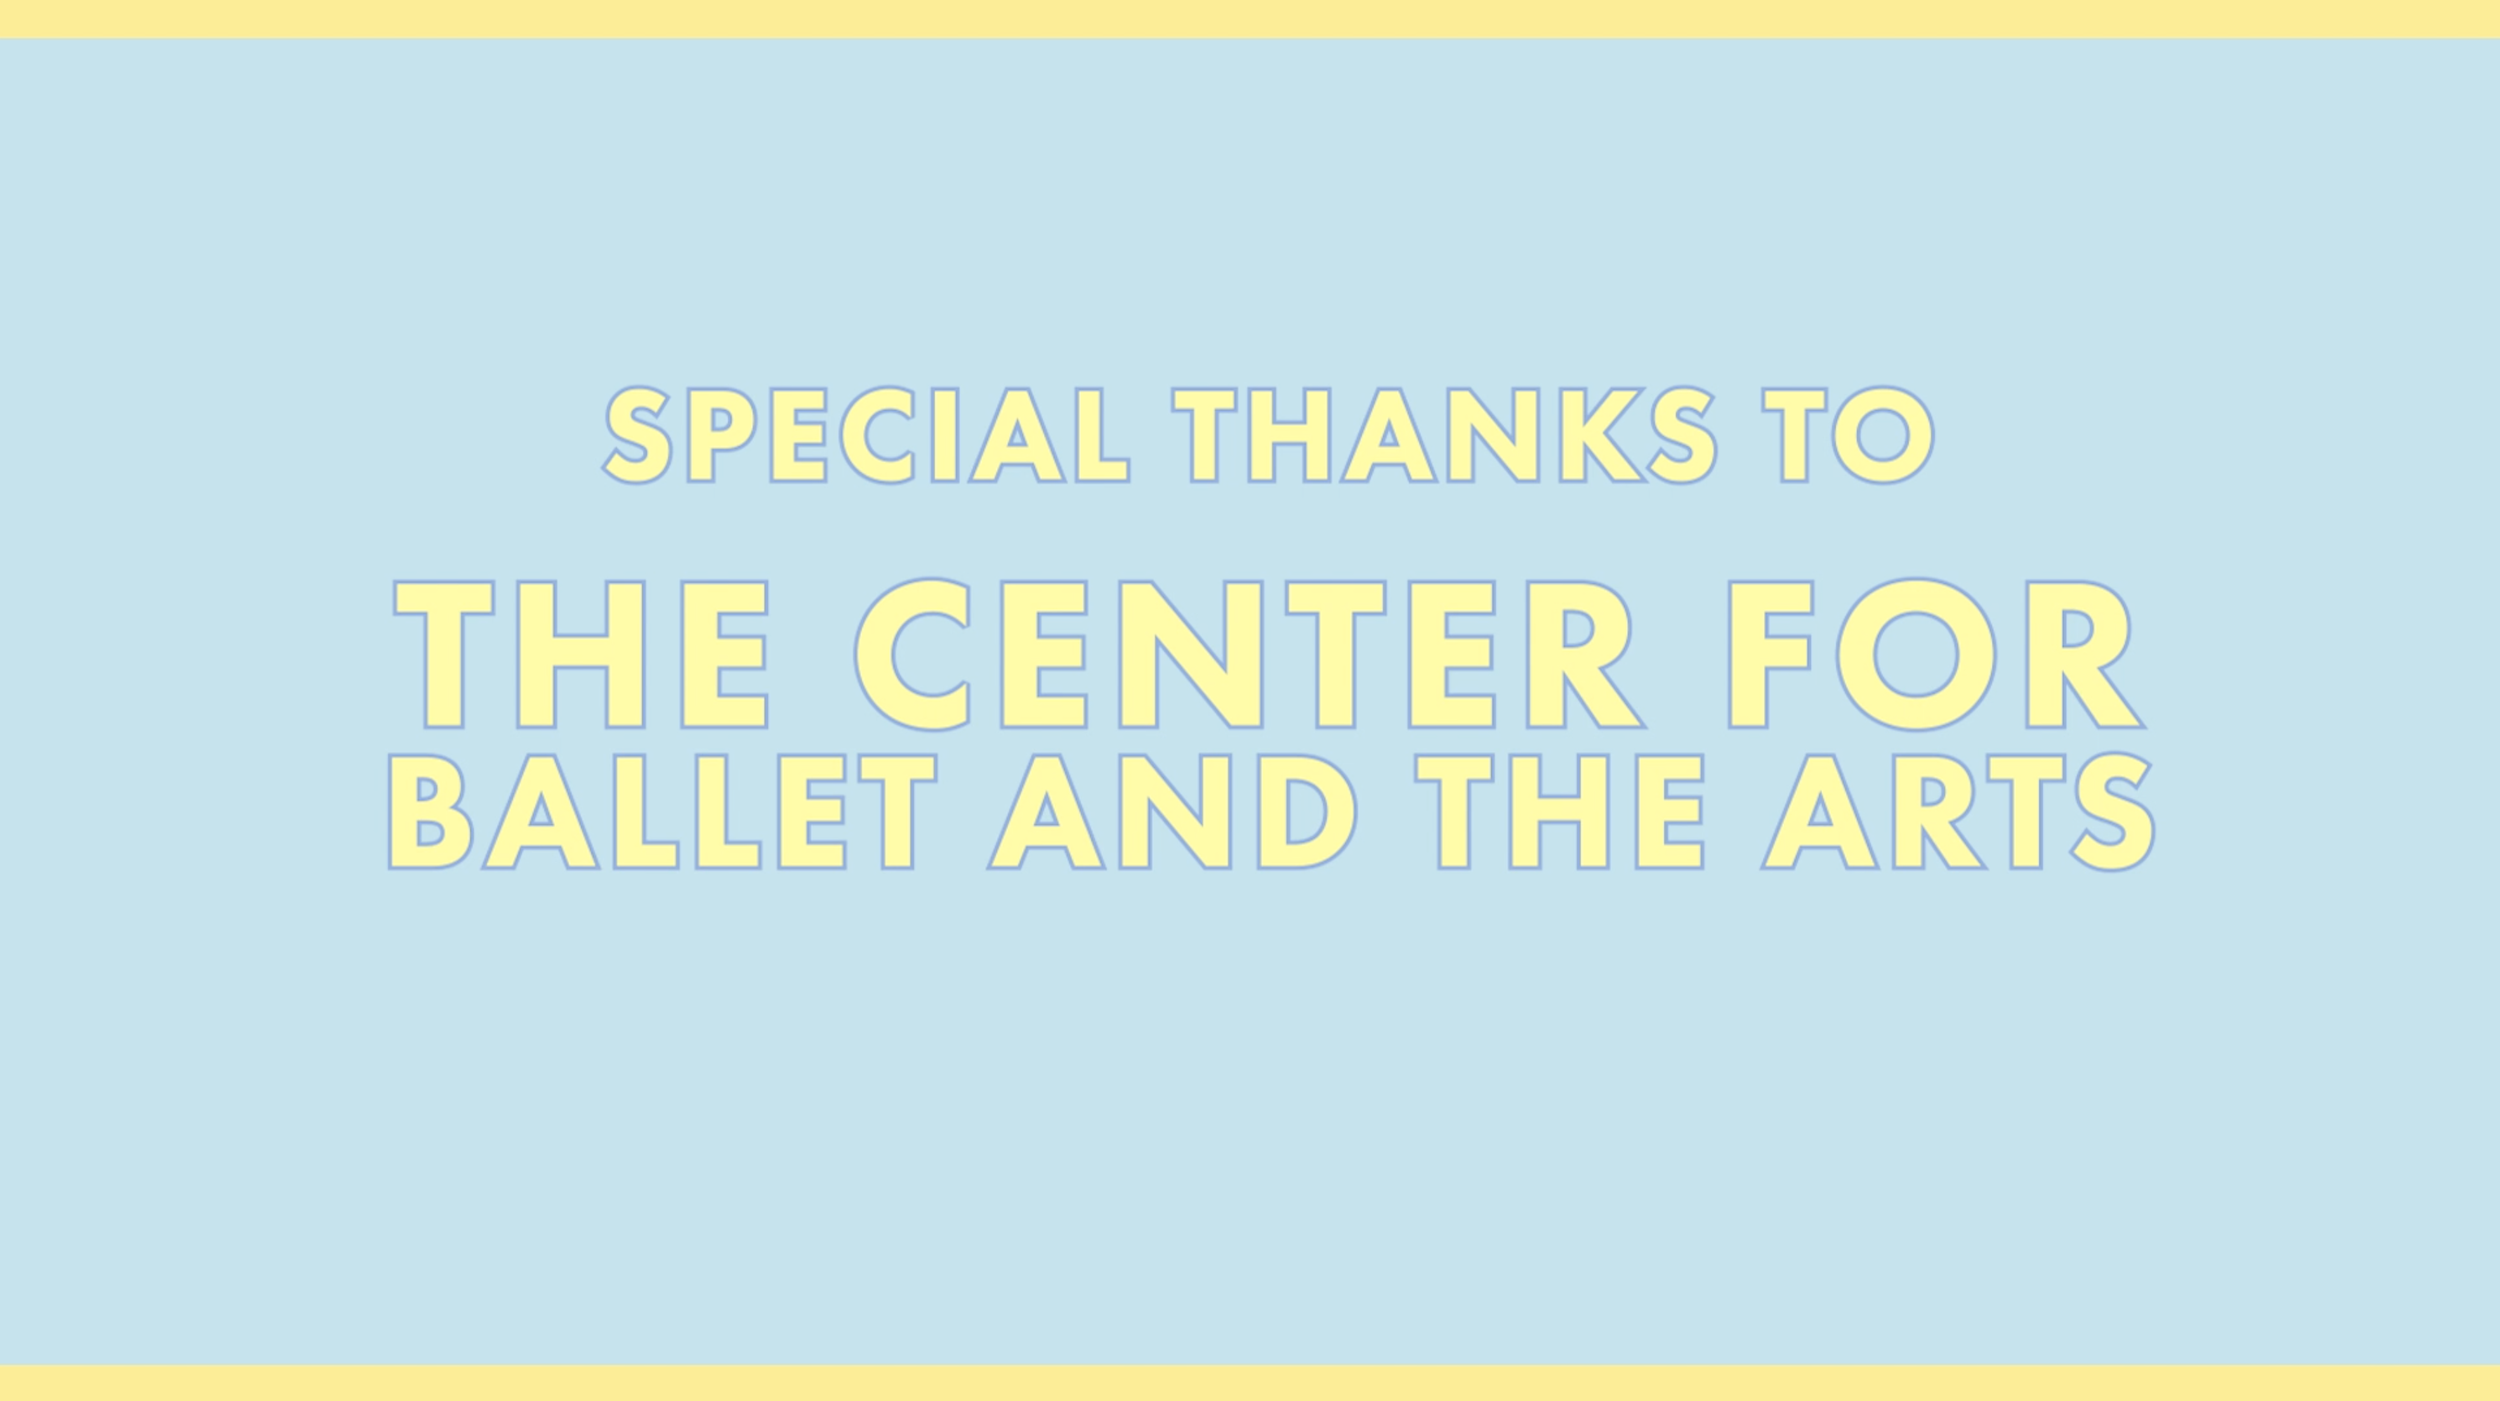 BalletandtheArts.png